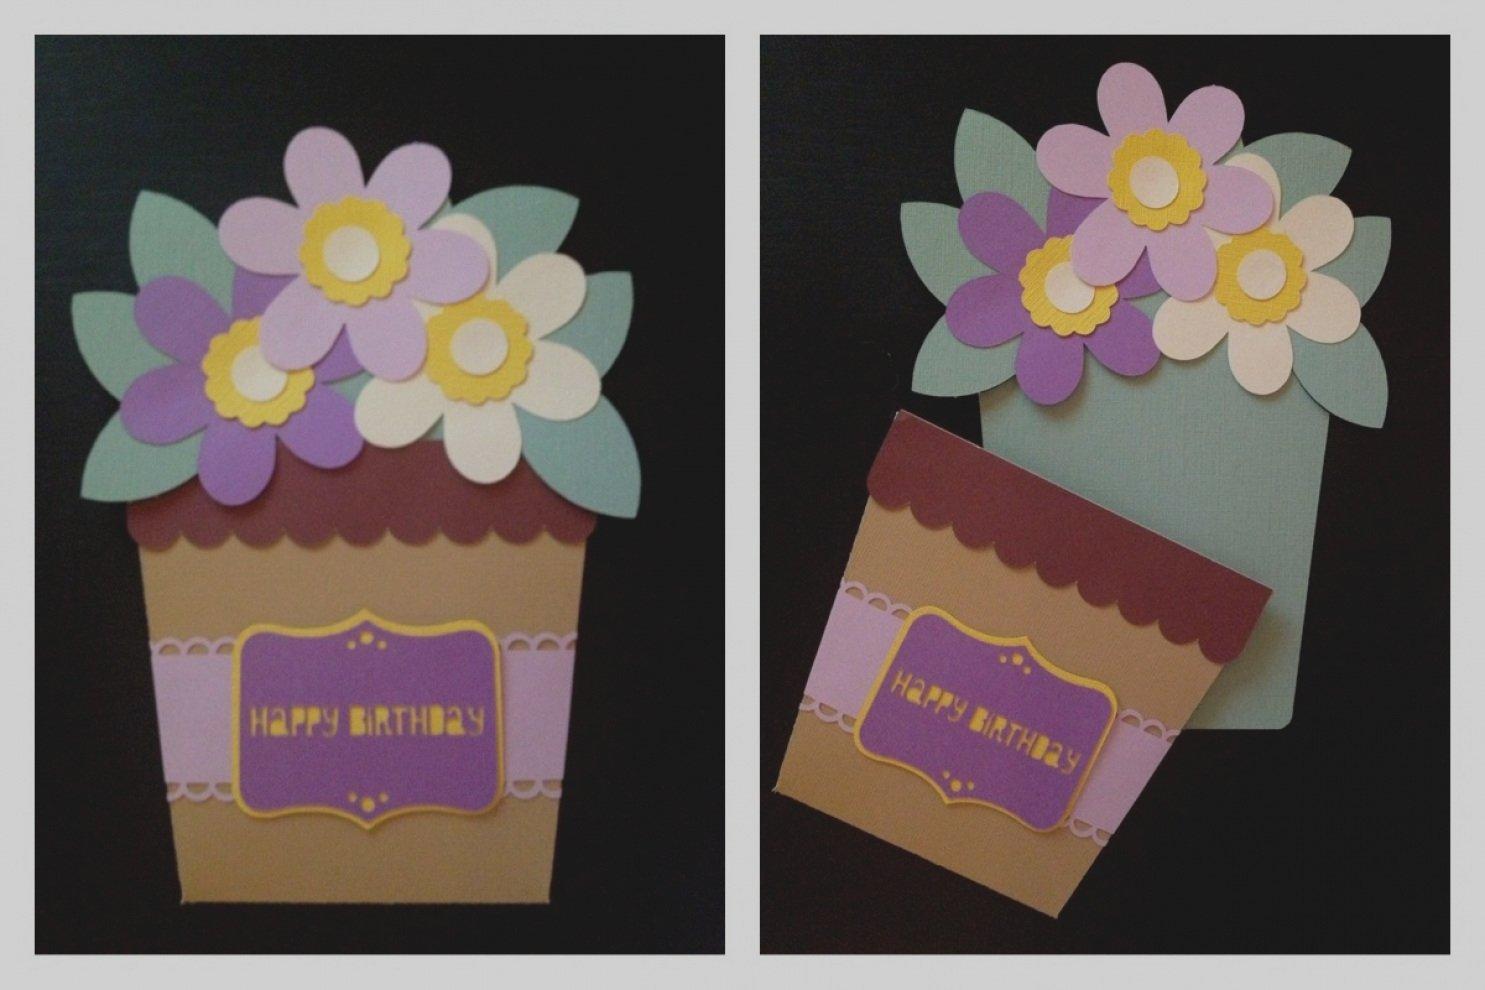 10 Attractive Birthday Card Ideas For Grandma latest birthday card ideas for grandma acrostic mother s day diy